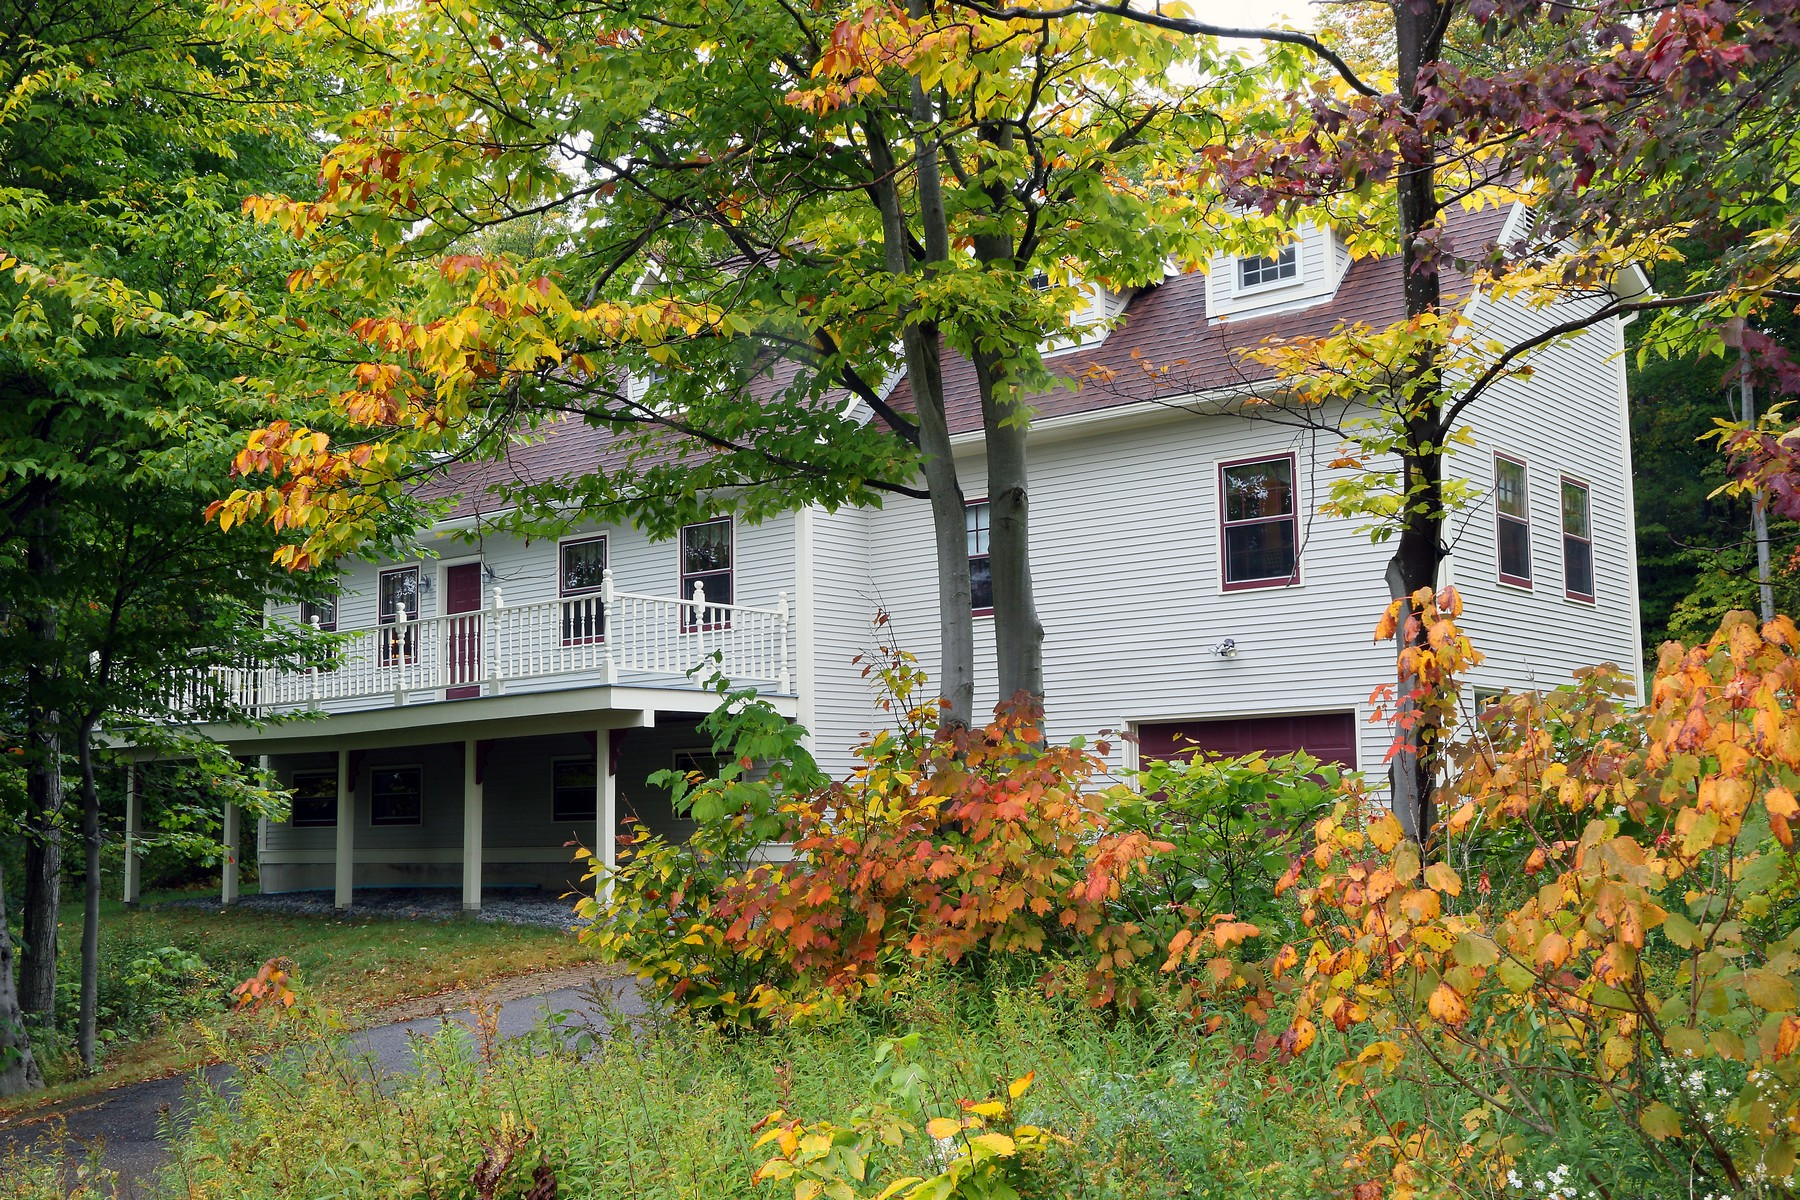 Moradia para Venda às 193 Wentworth Road, Bolton 193 Wentworth Rd Bolton, Vermont, 05676 Estados Unidos